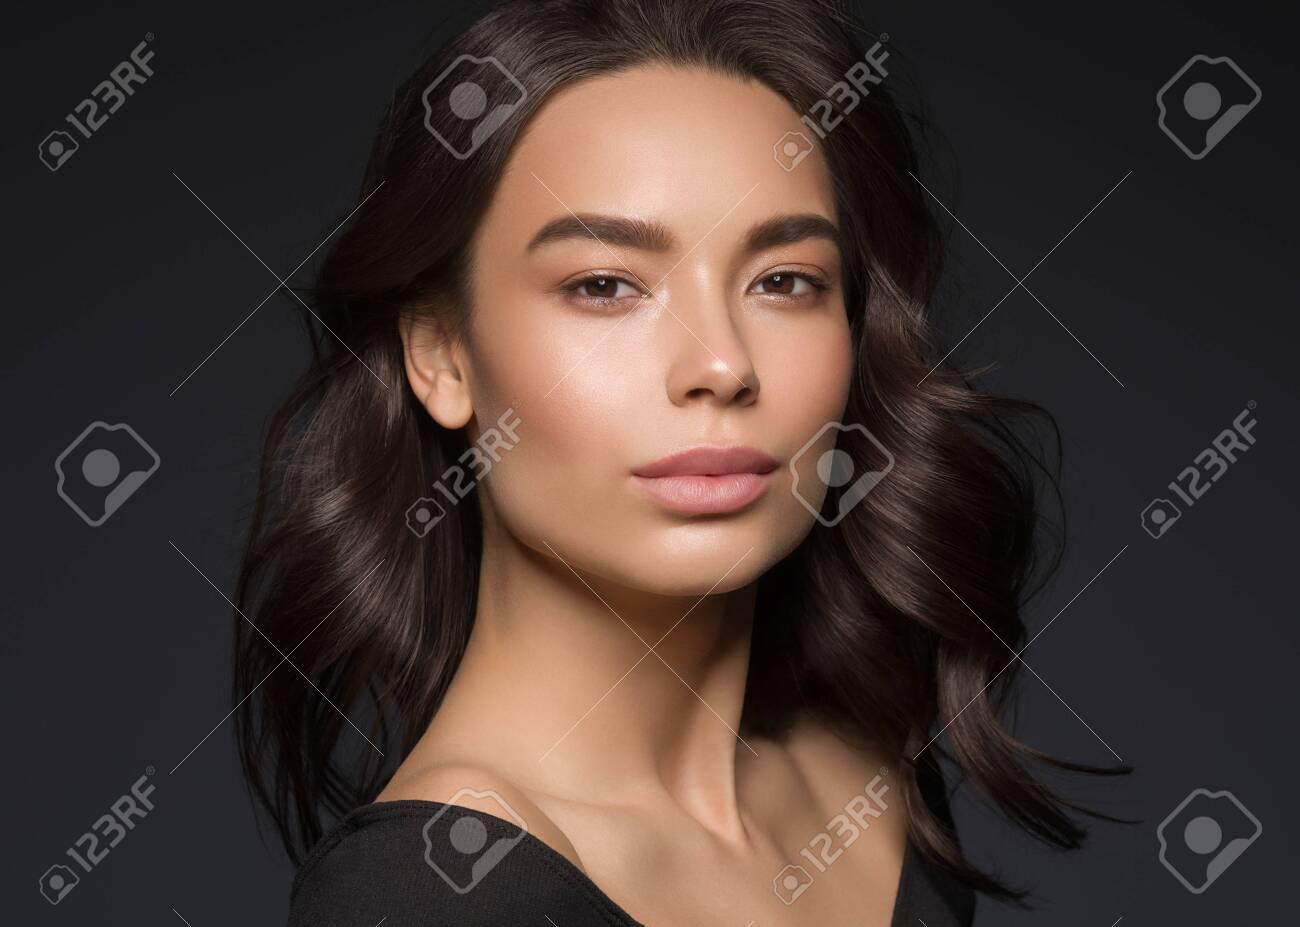 Asian beauty female black background curly black hair natural make up. Studio shot. - 143647655